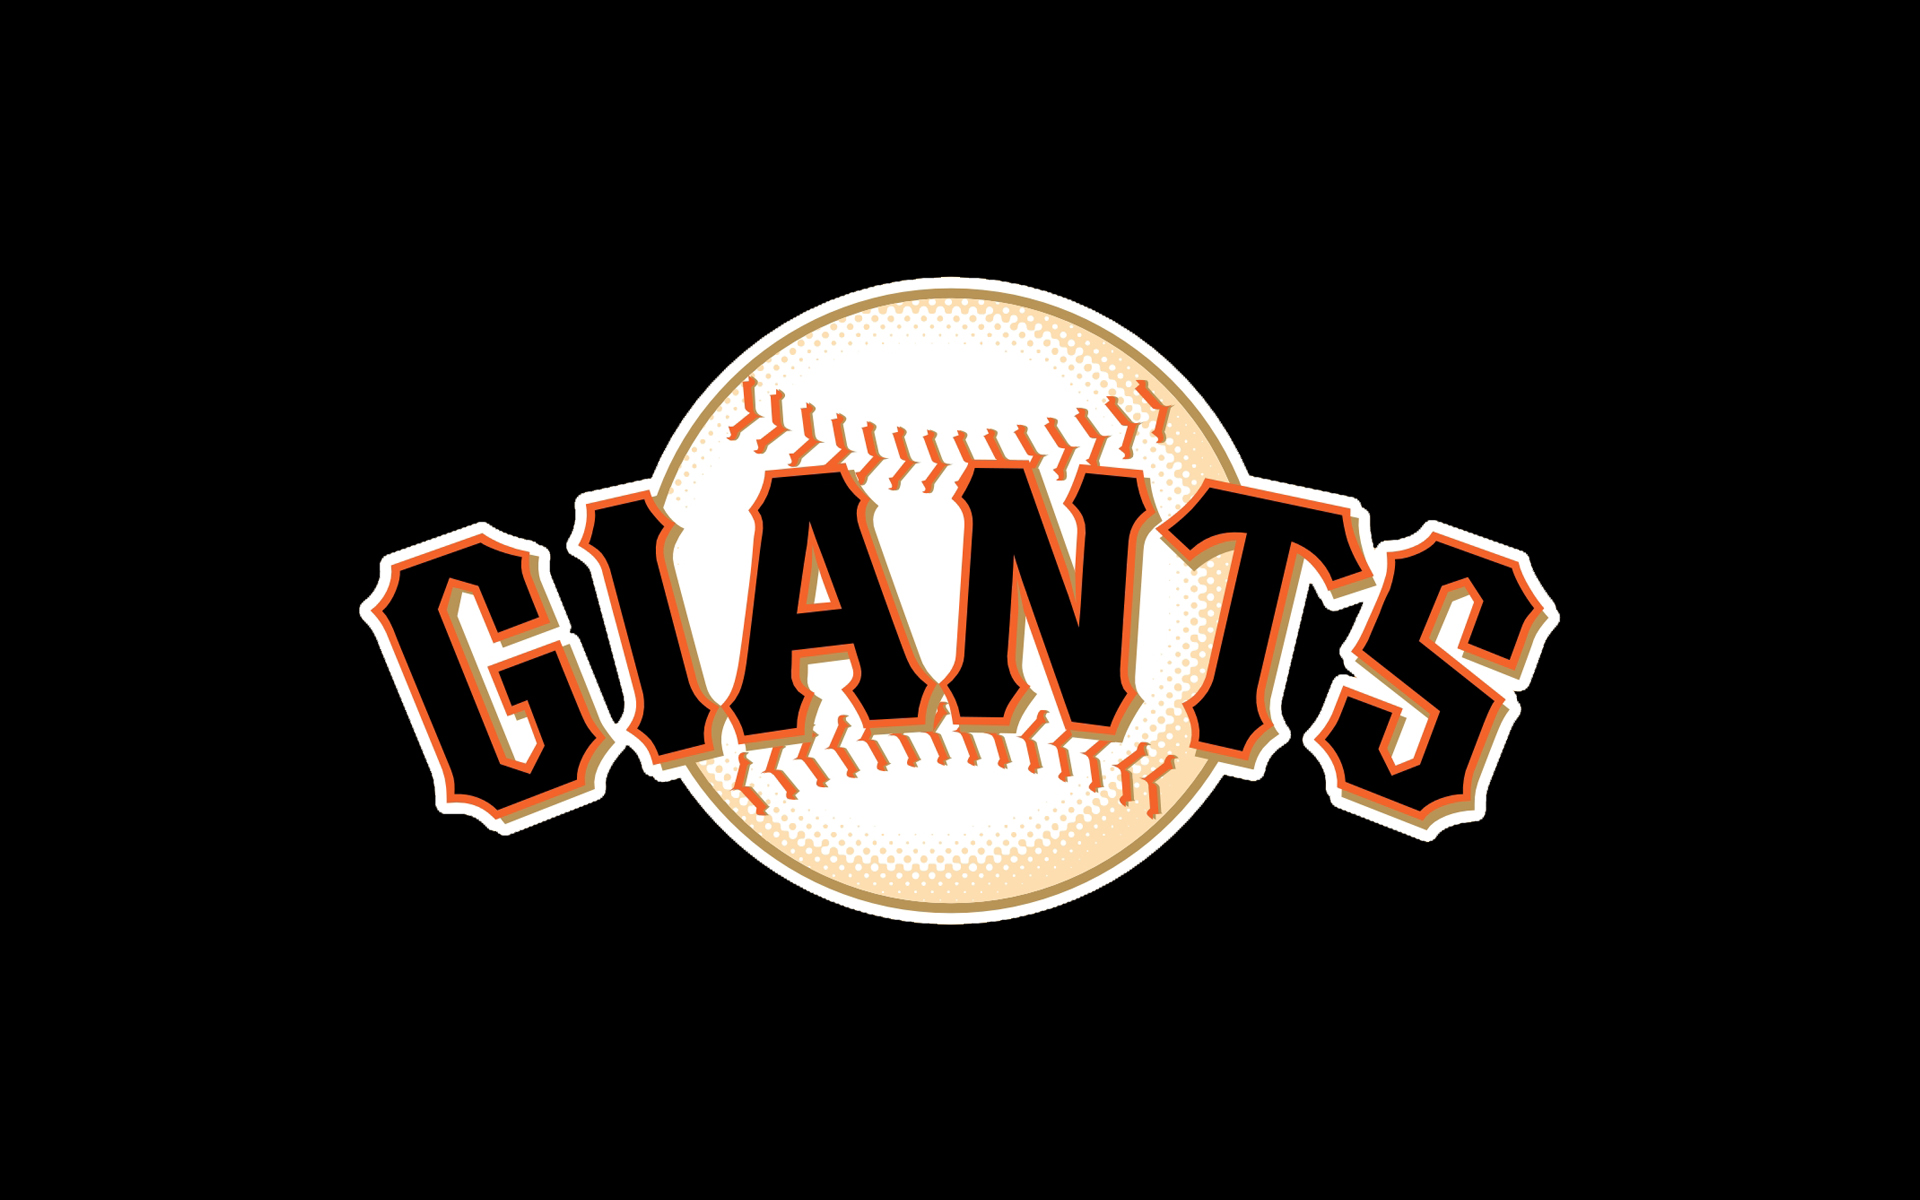 SF Giants Screensaver